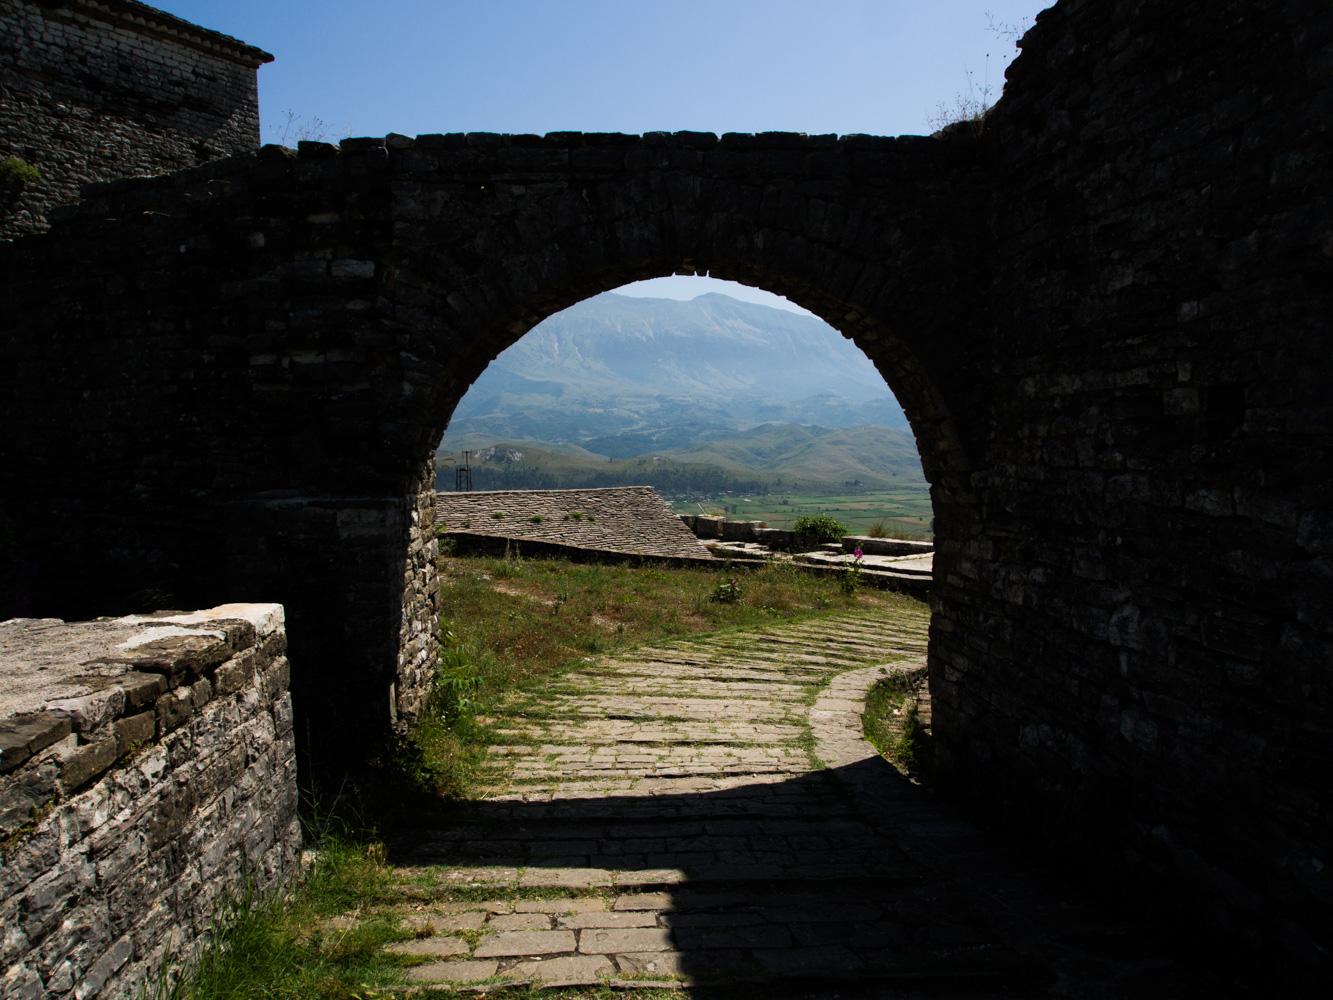 albania_gijrokaster-1-of-1-9